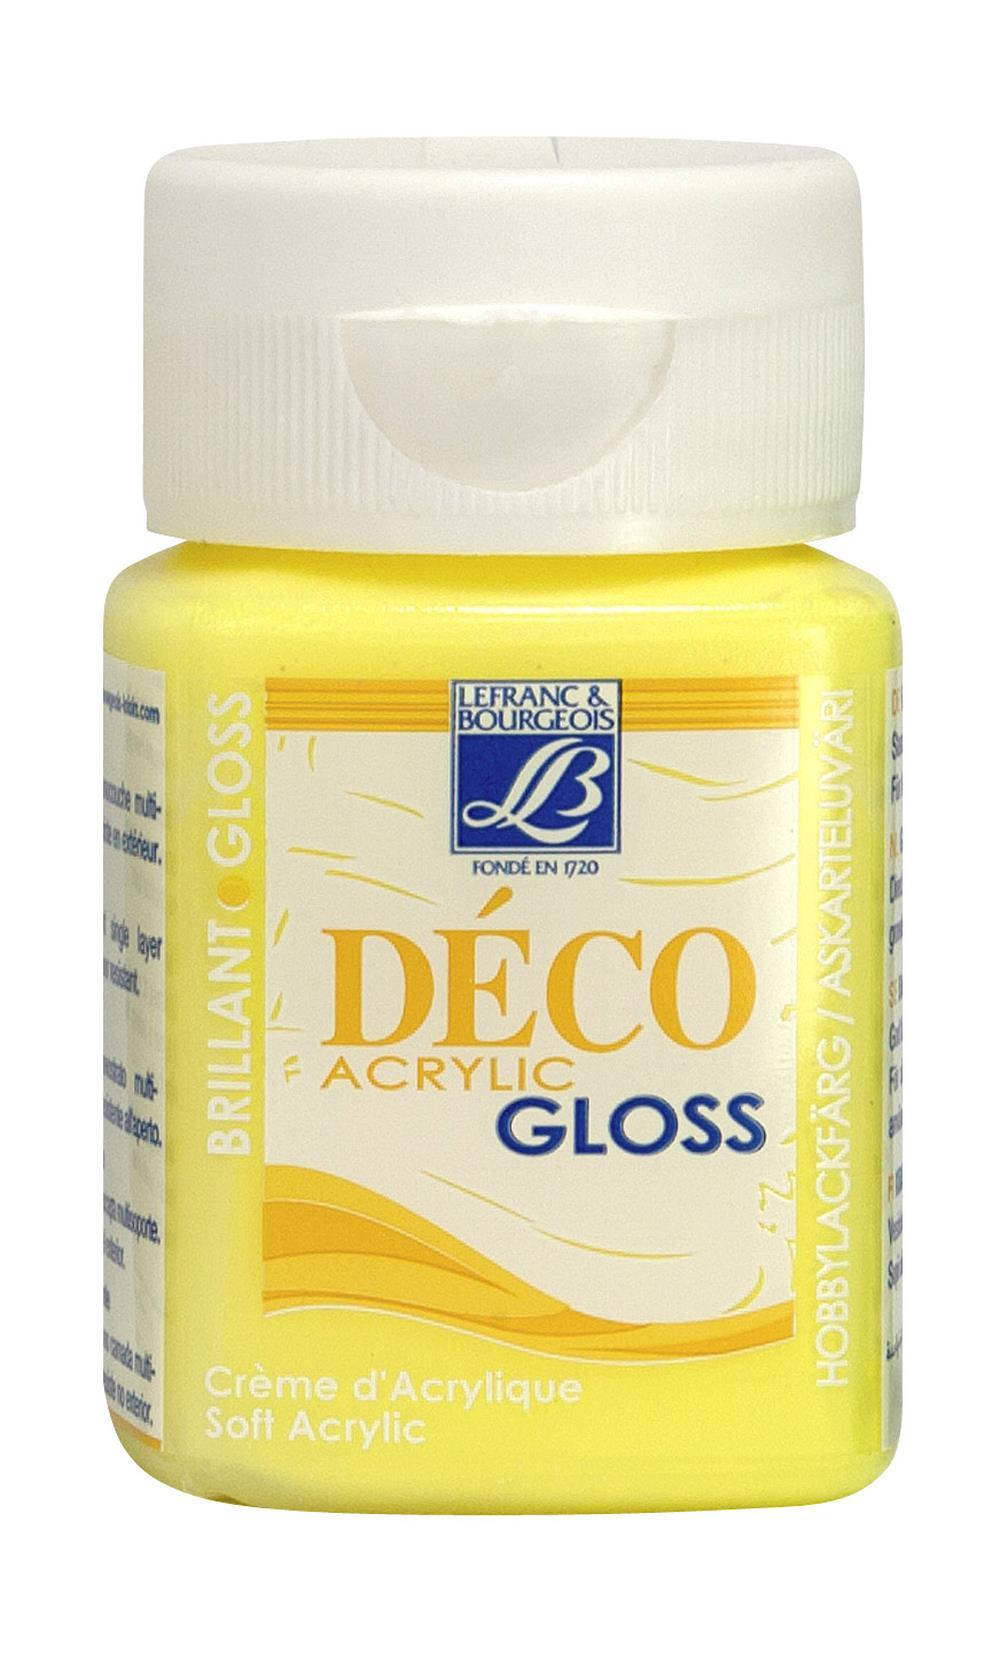 Hobbyfärg L&B Deco Gloss Akryl 50ml  Mimosa 189 (4F) Utgår